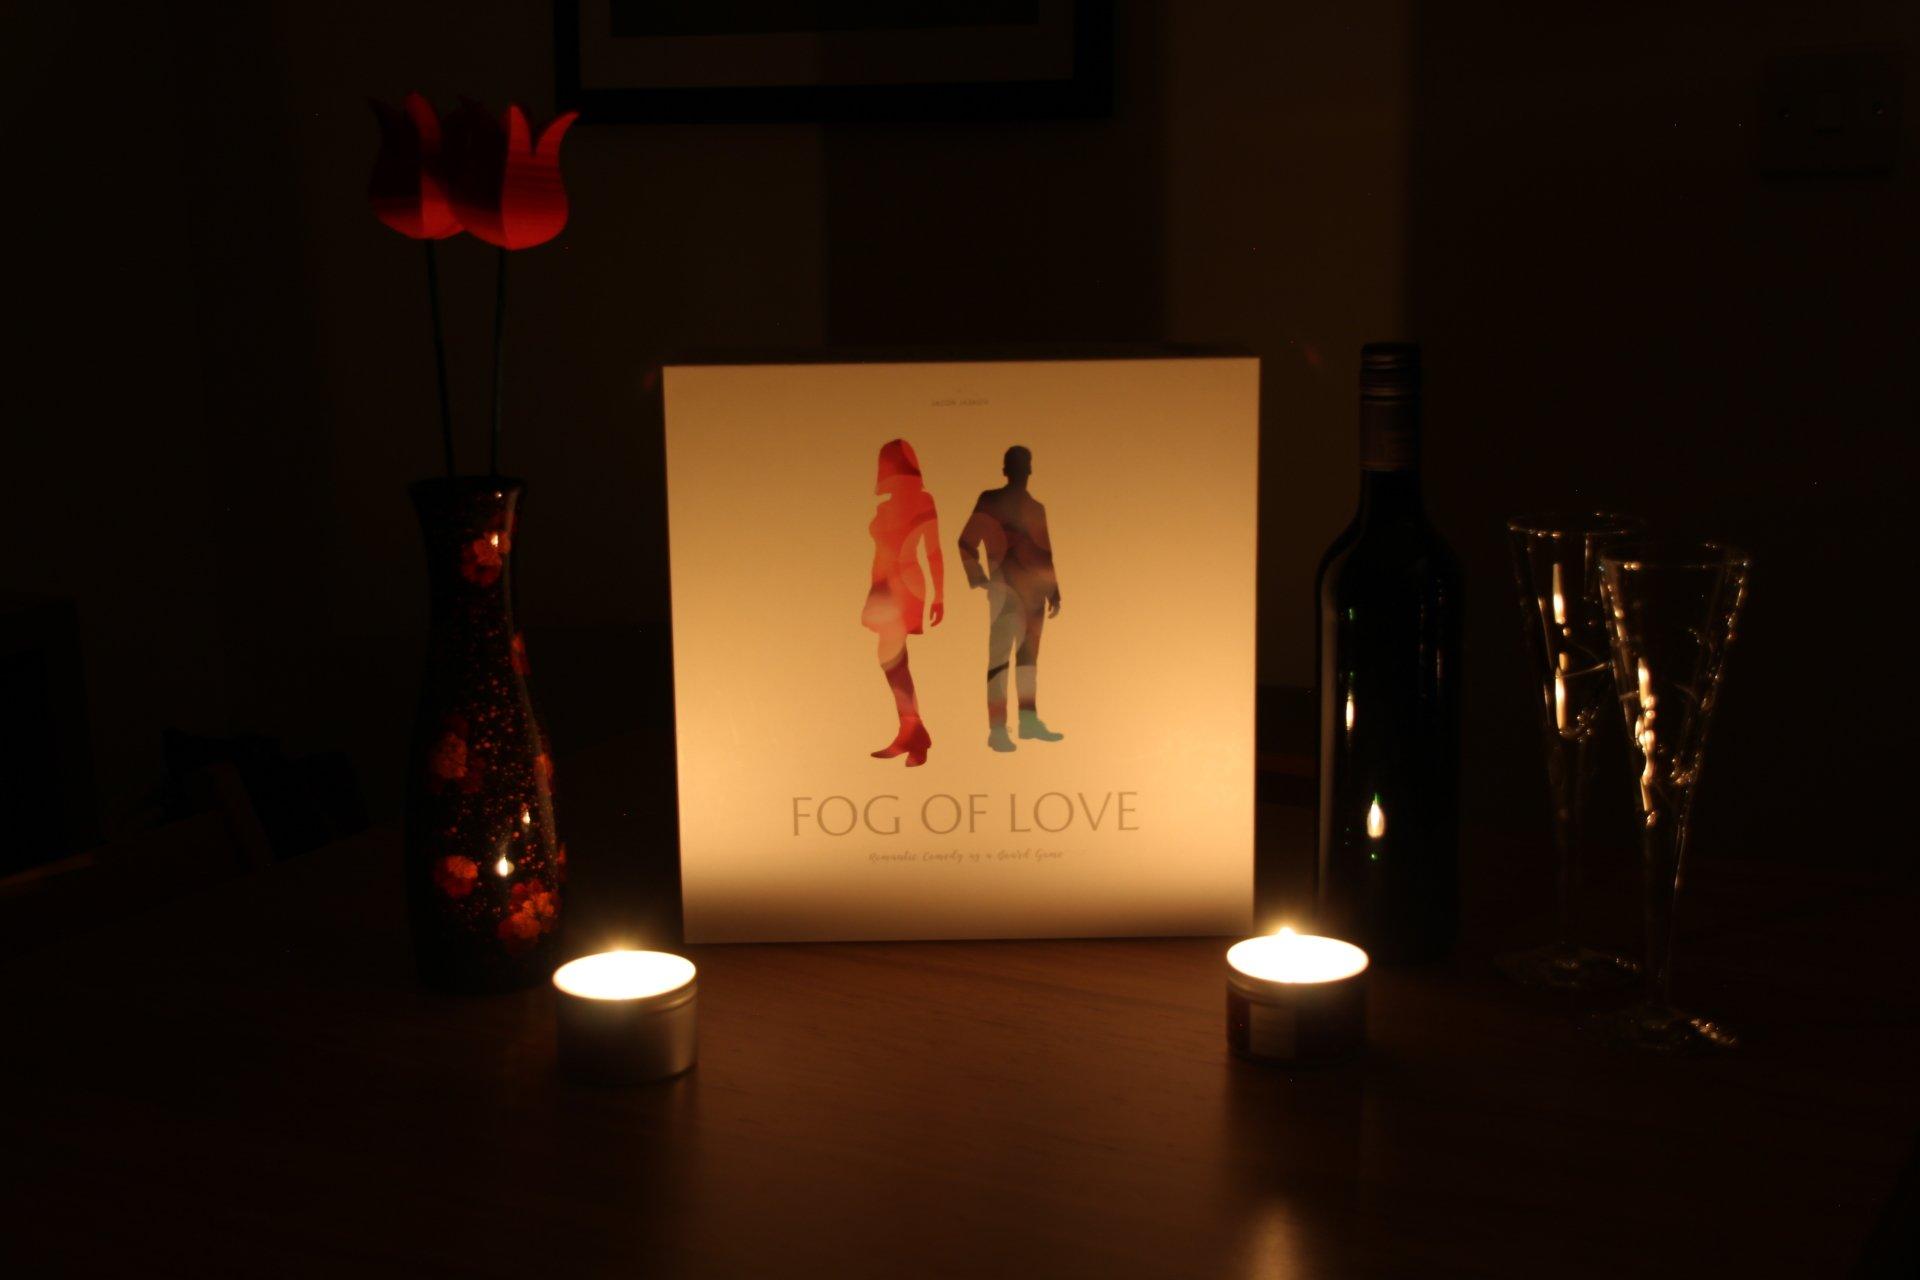 Art Board Fog of Love Photographs